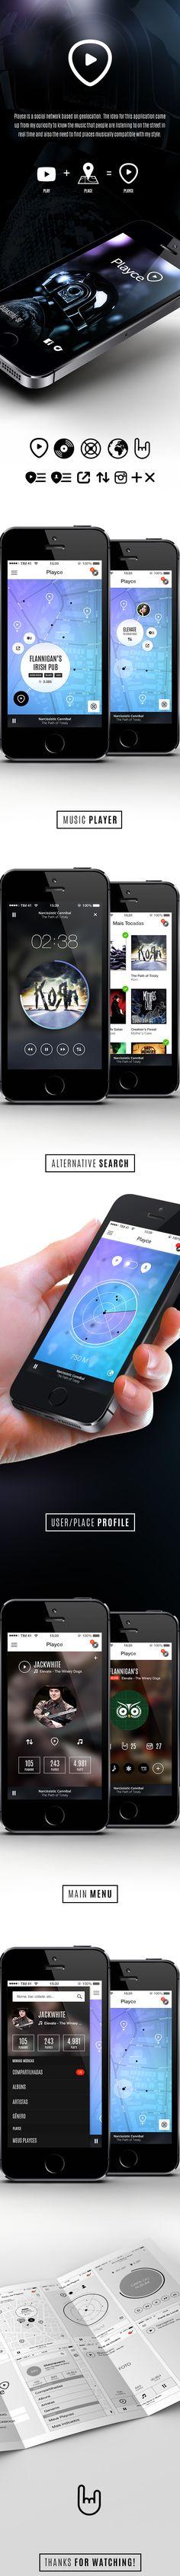 Playce - App Design by Leonardo Navarro